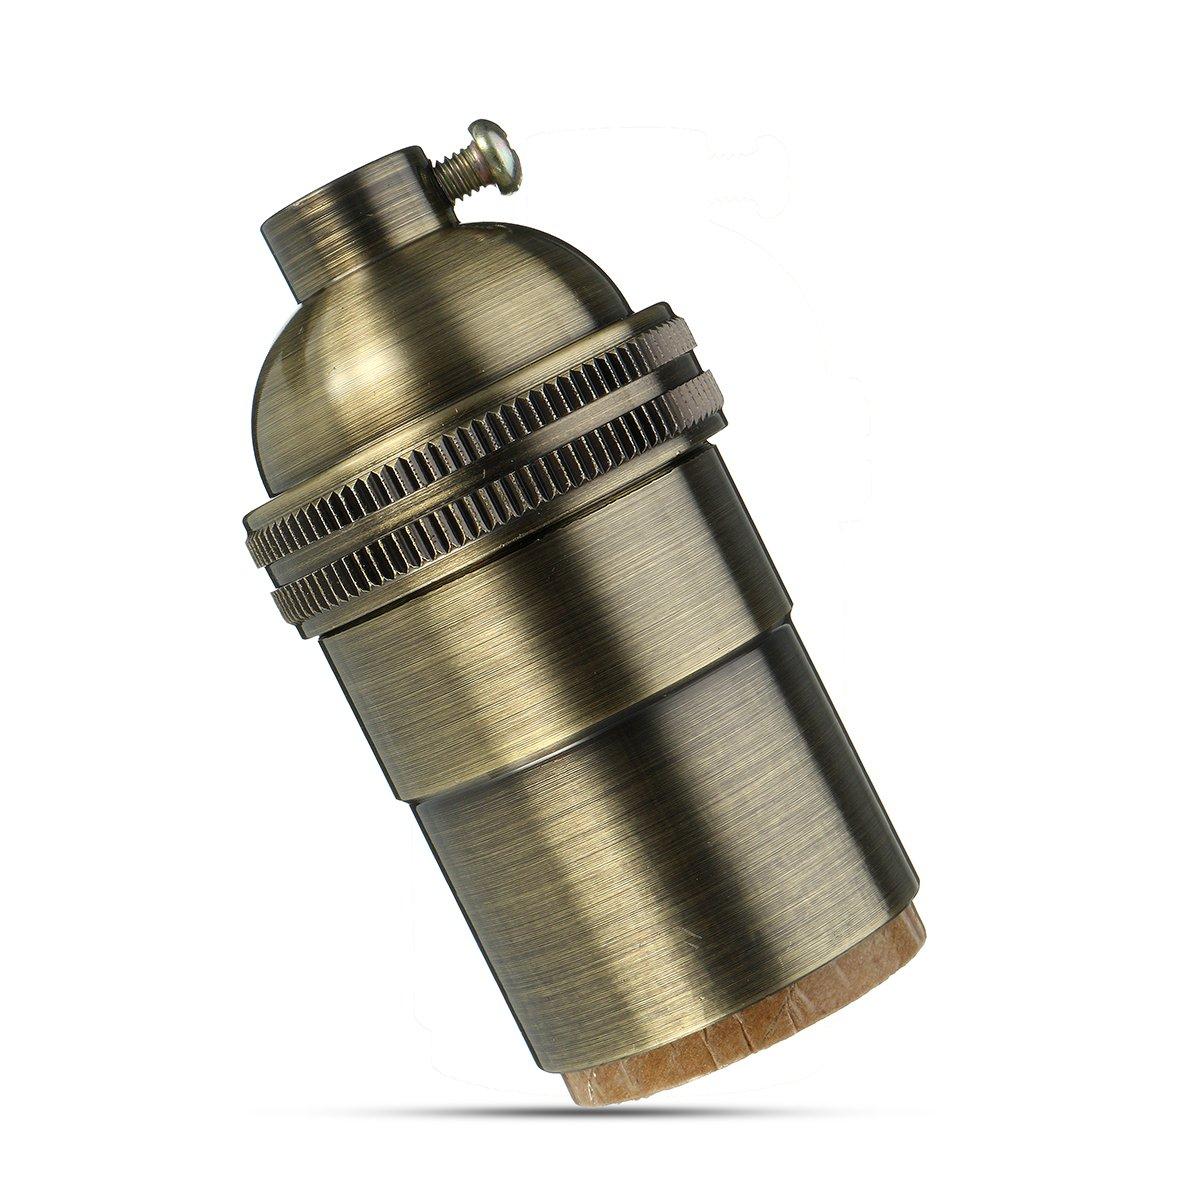 MASUNN E26 E27 Retro en Laiton Massif Lumi/ère Douille De Lampe Industrielle Vintage Support AC110-250V-Bronze